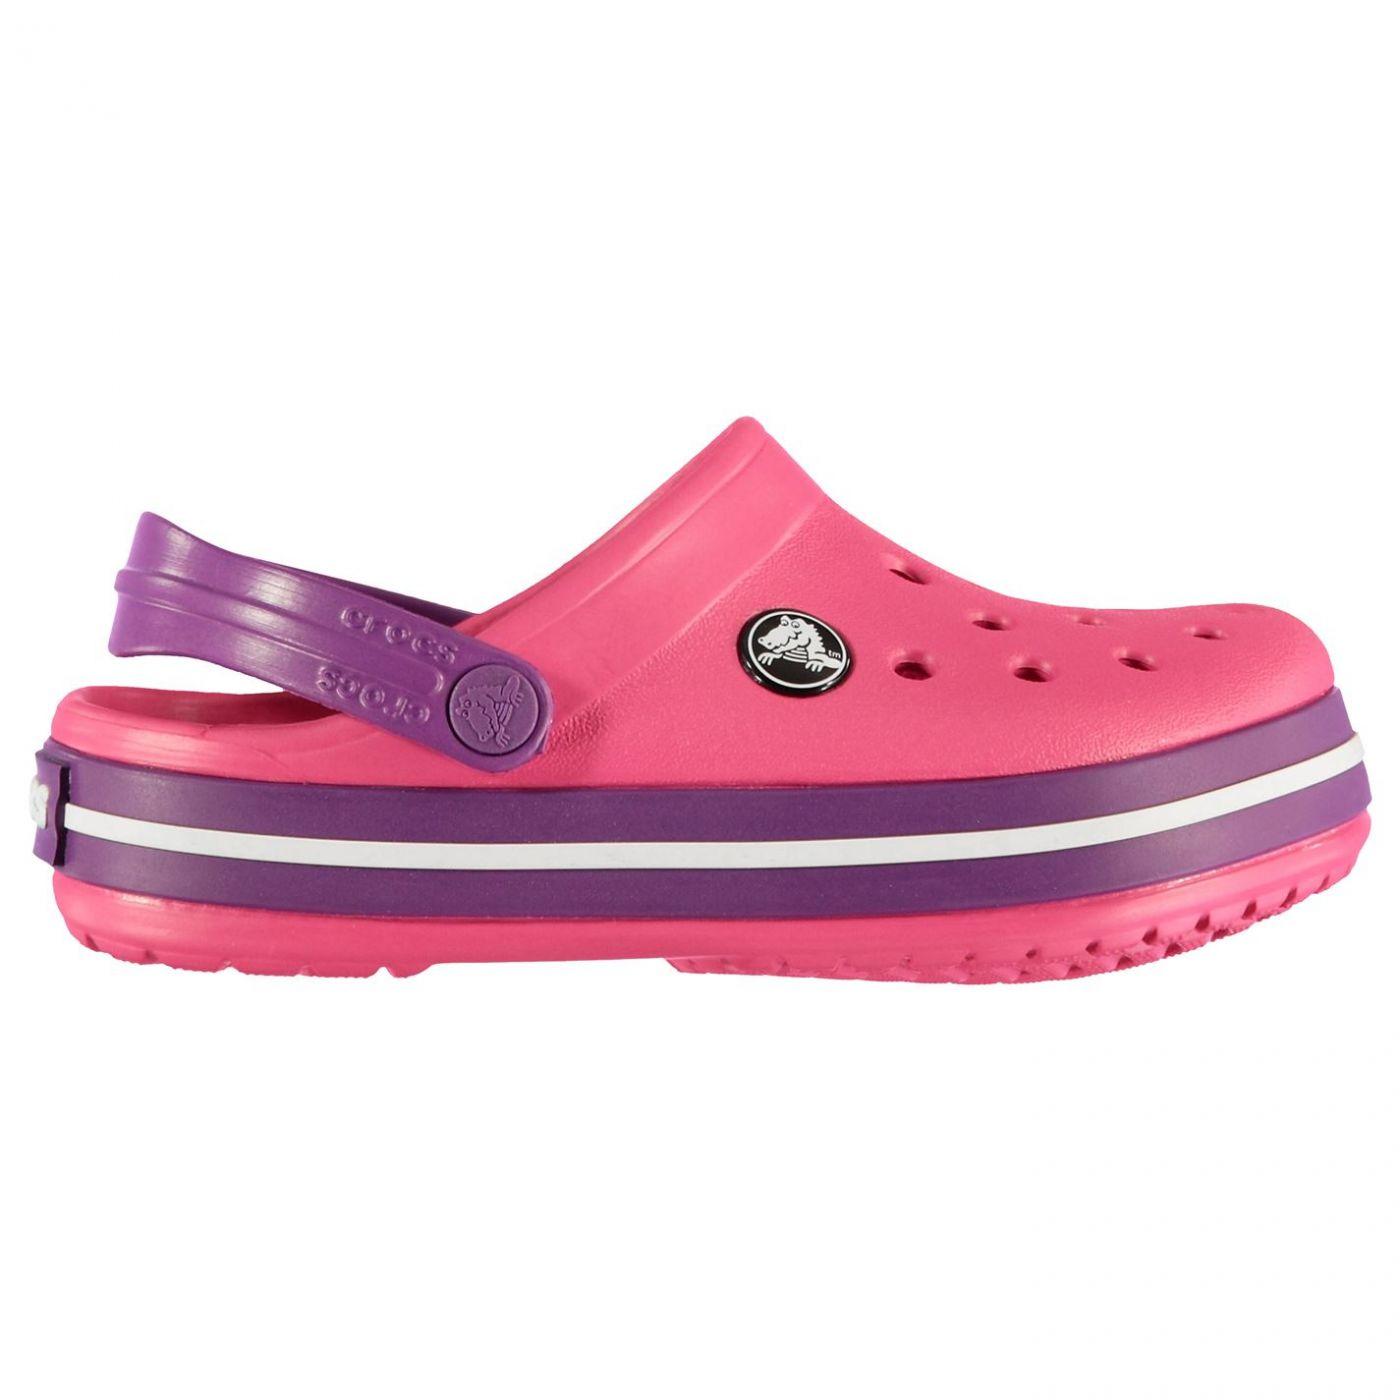 Crocs Clogs Unisex Child